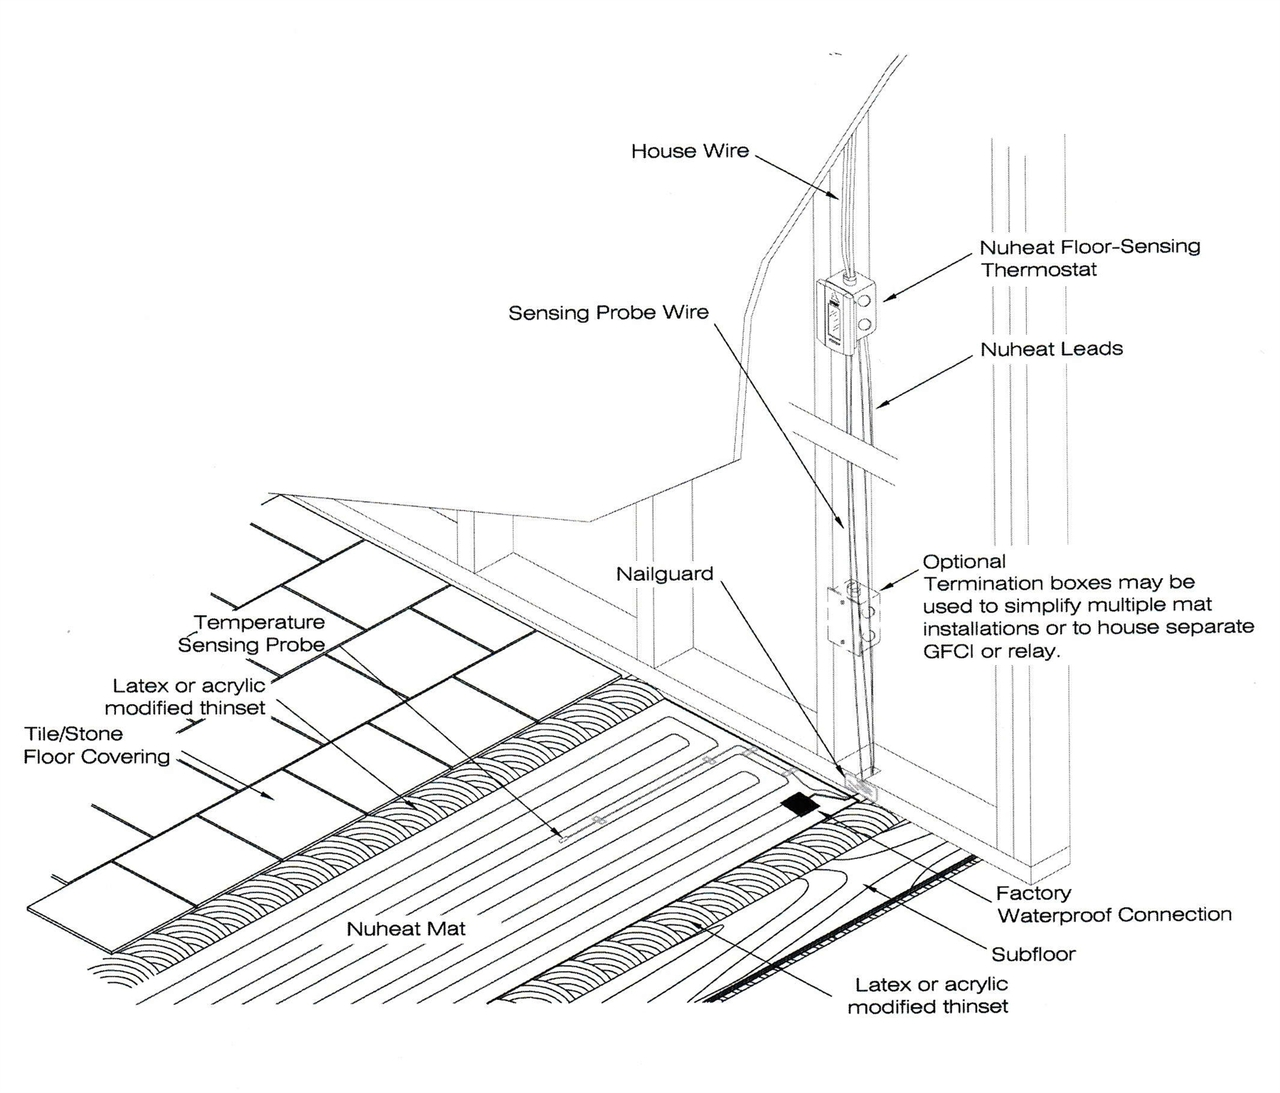 nuheat electric floor heating mat 10 ft series 240 volt Basement Wiring Diagram